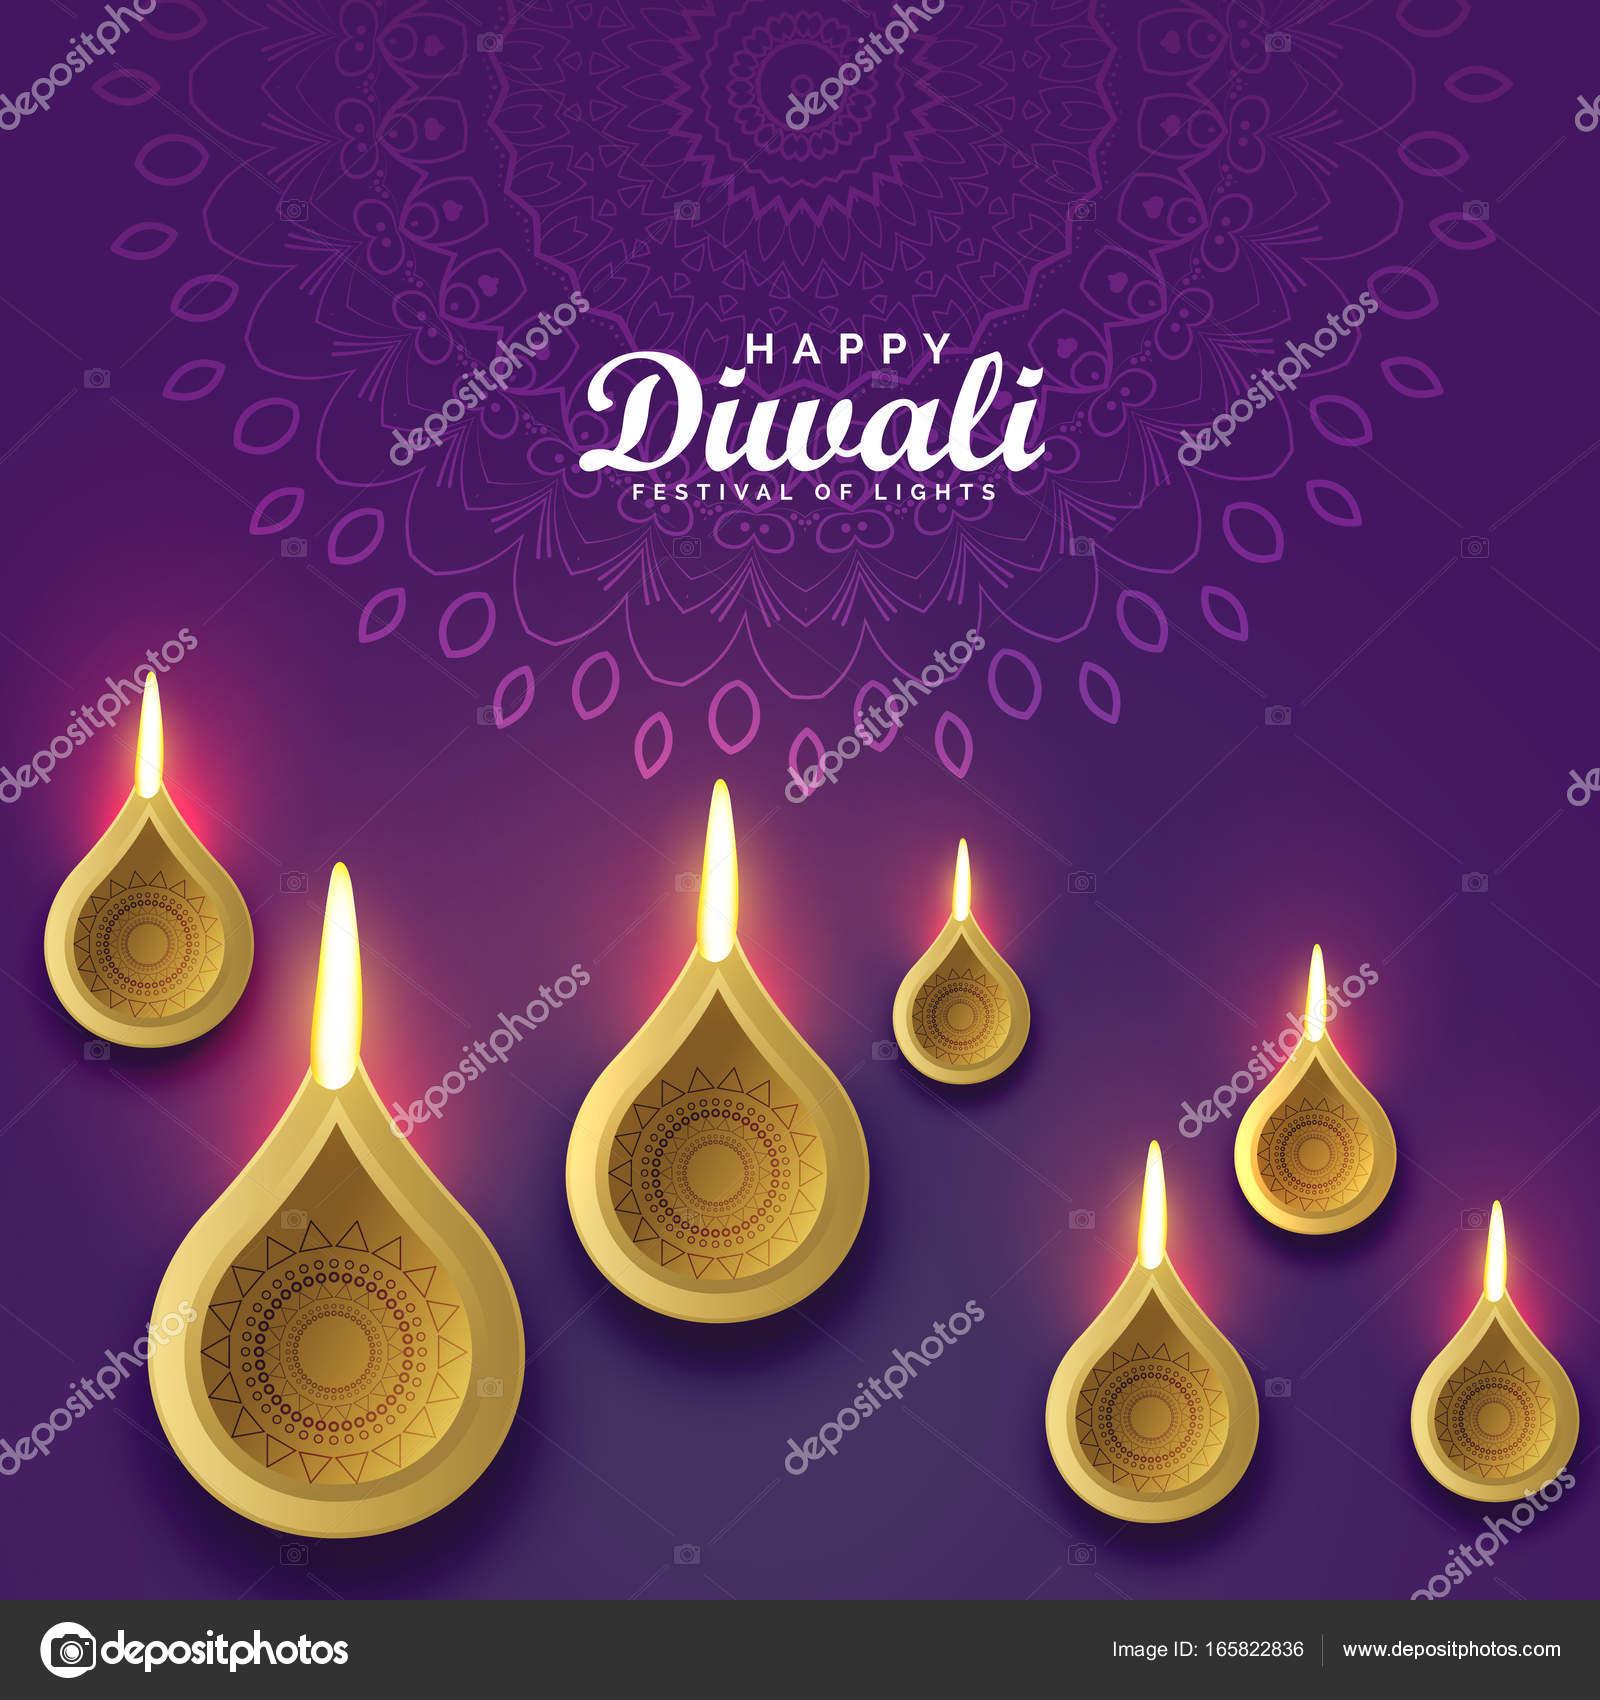 Diwali Greeting Card Design With Golden Diya Stock Vector